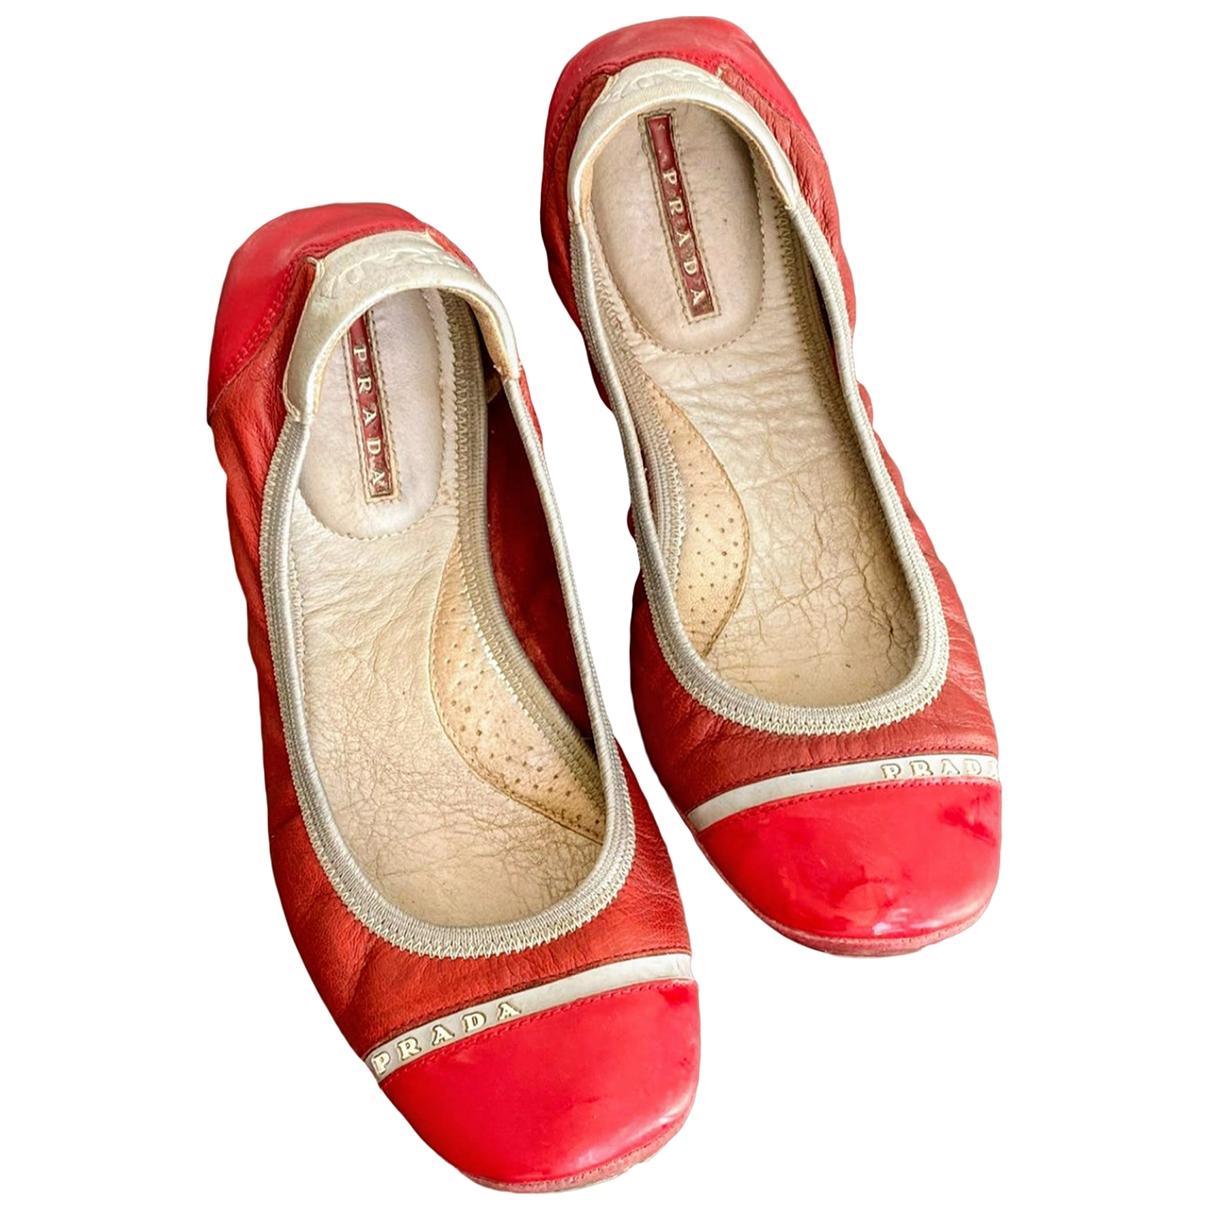 Prada \N Red Leather Ballet flats for Women 37 EU